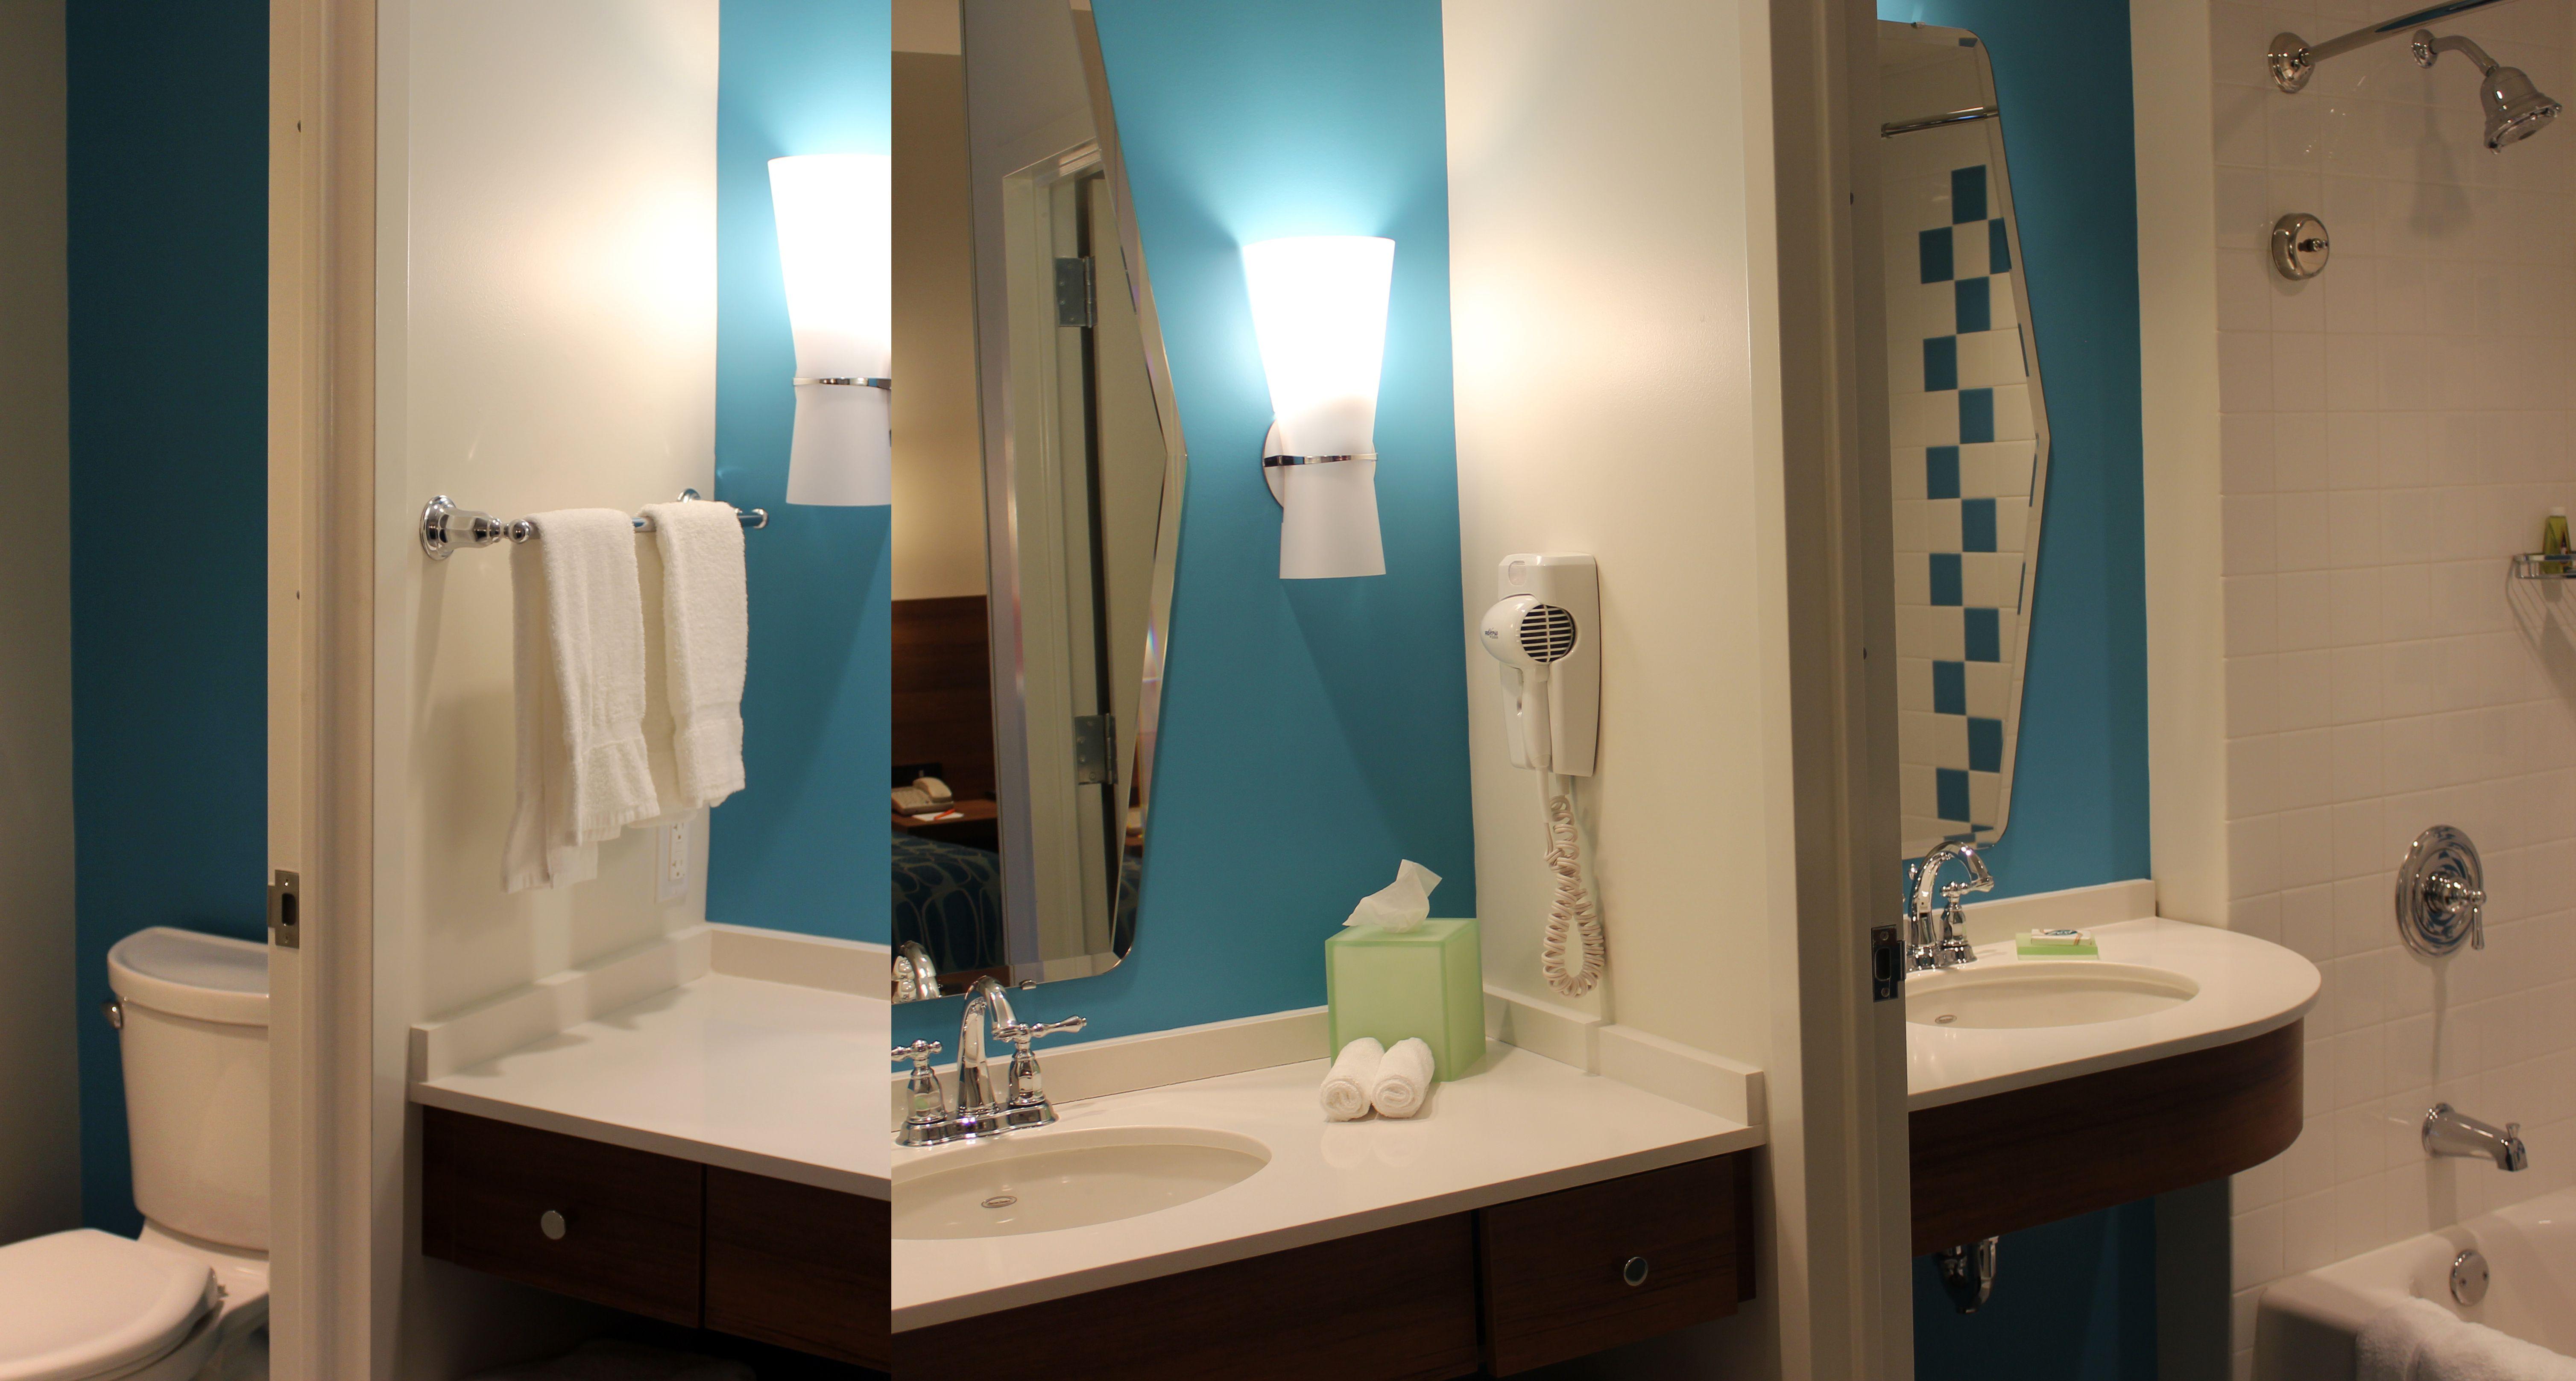 Cabana Bay Universal Orlando Bathroom